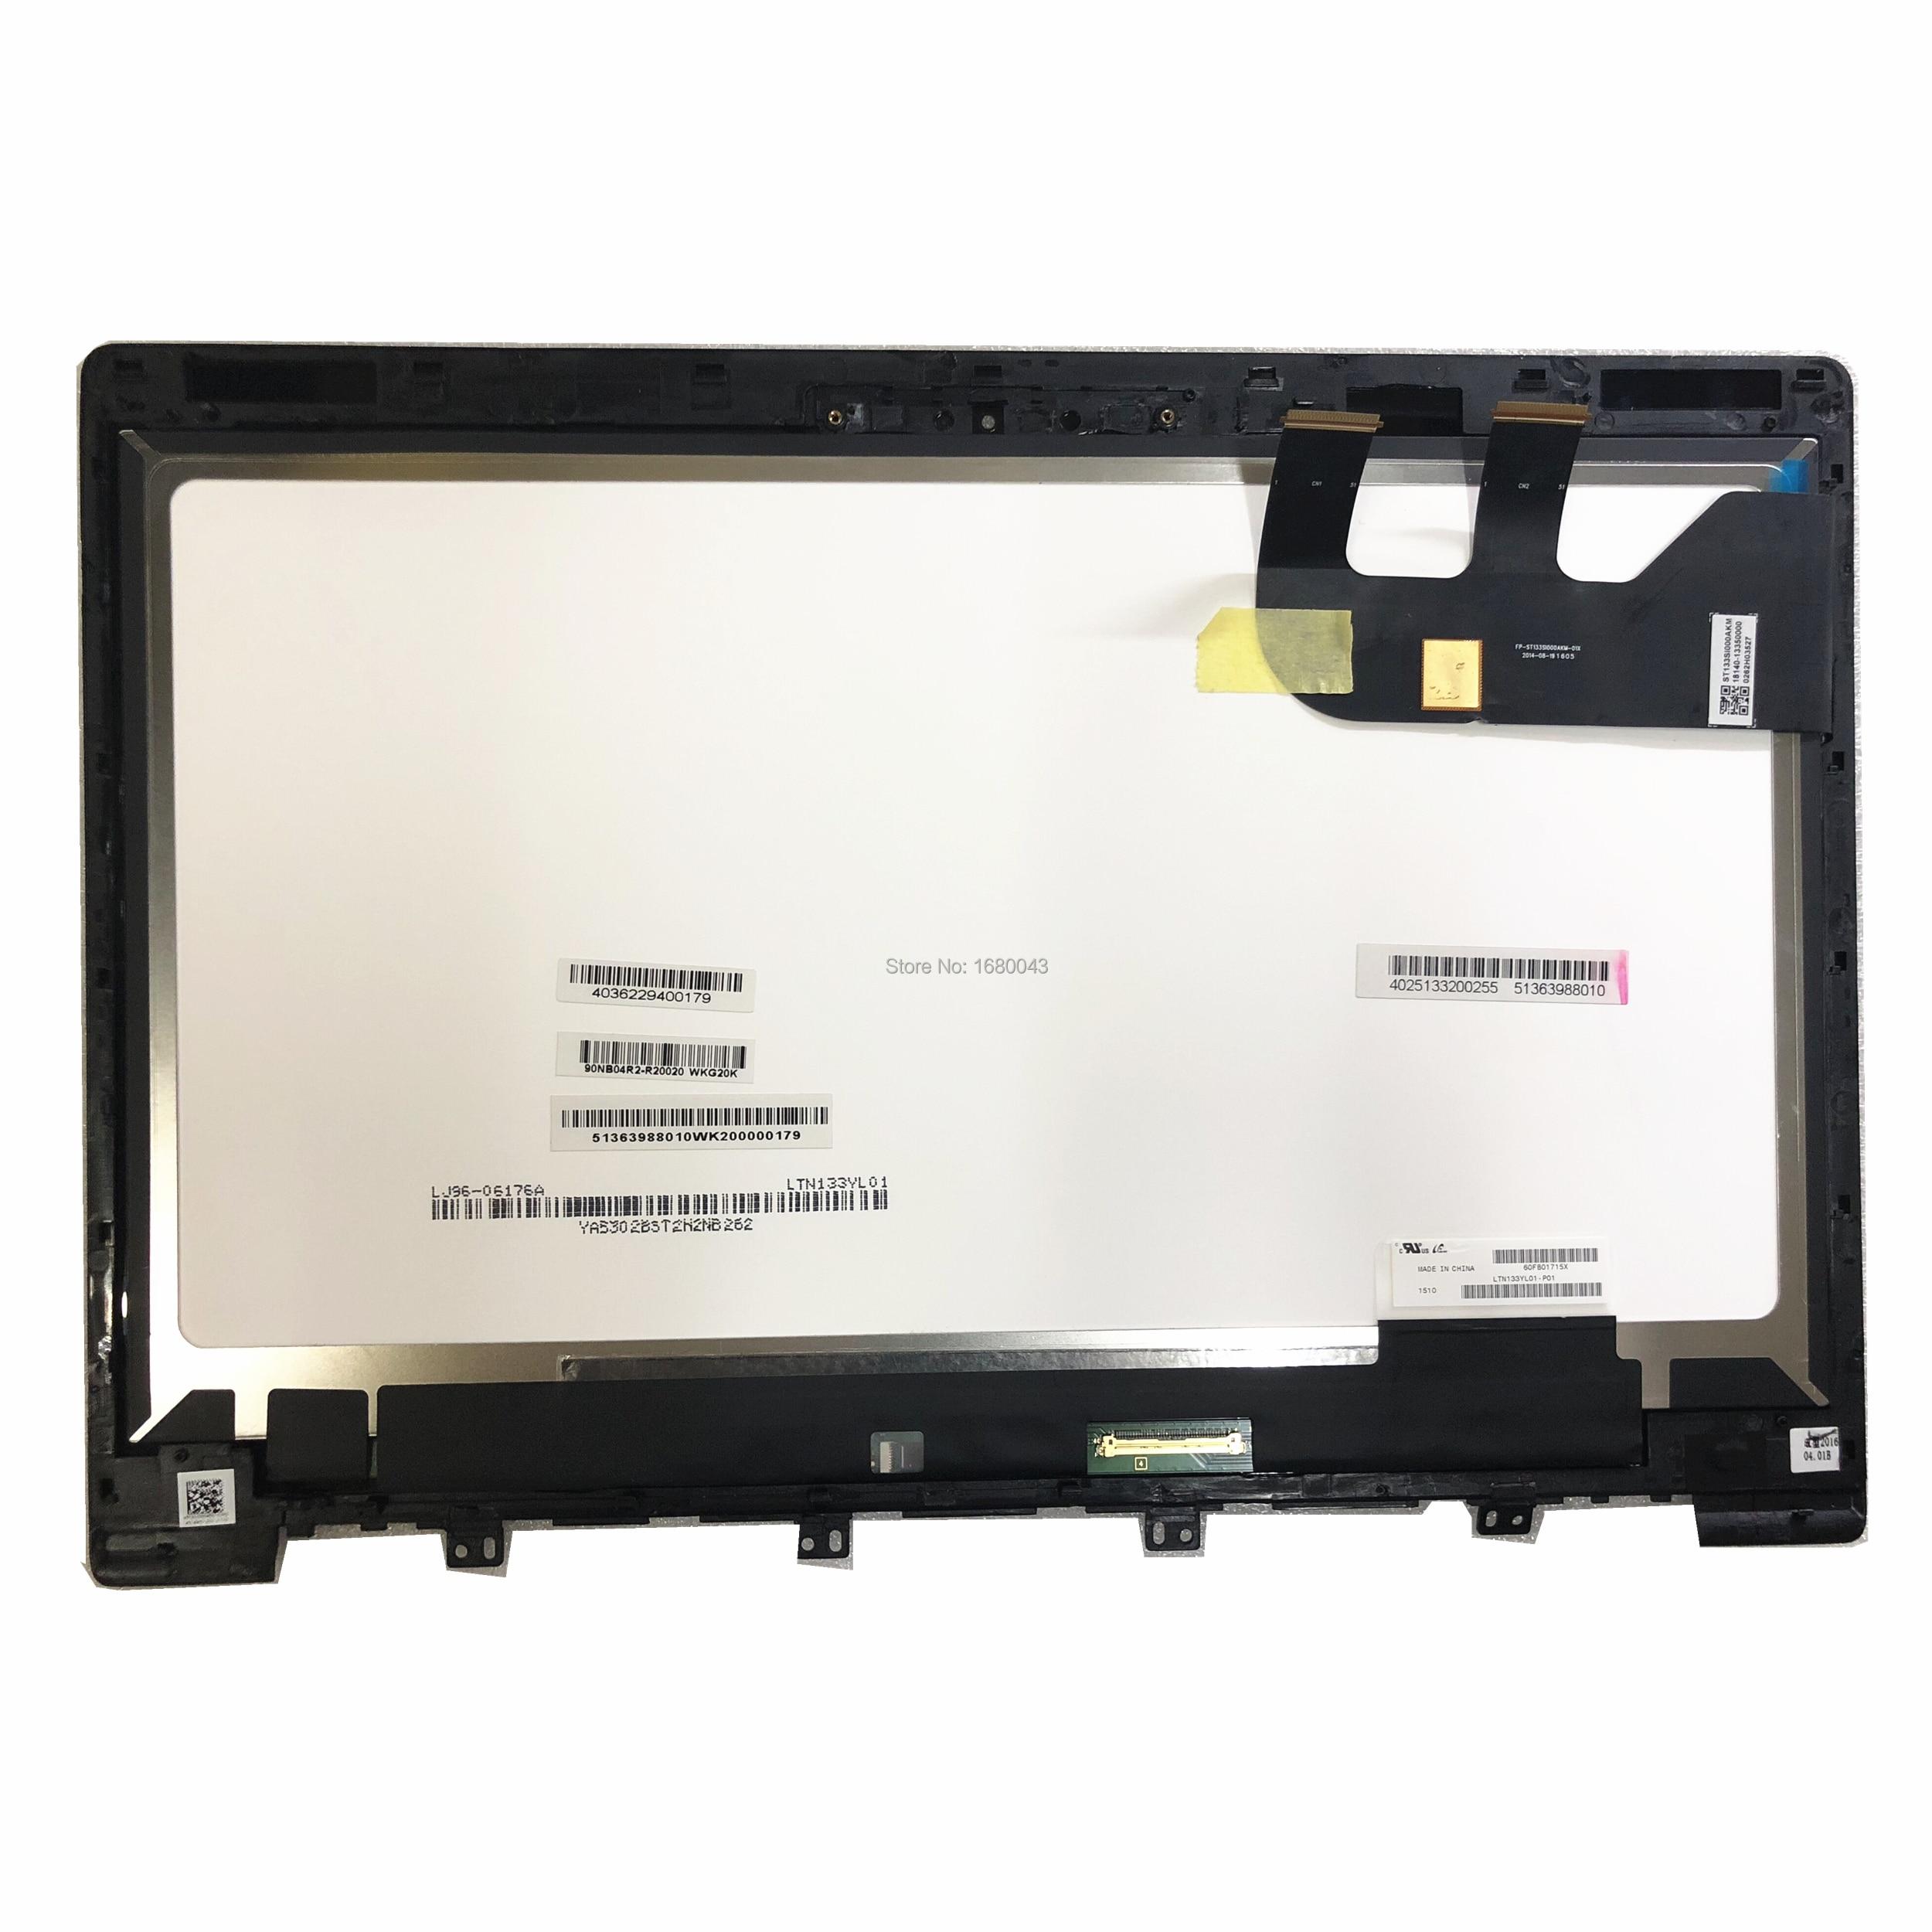 LTN133YL01 P01 pantalla LCD digitalizador de pantalla táctil marco de montaje FP-ST133SI000AKM-01X...